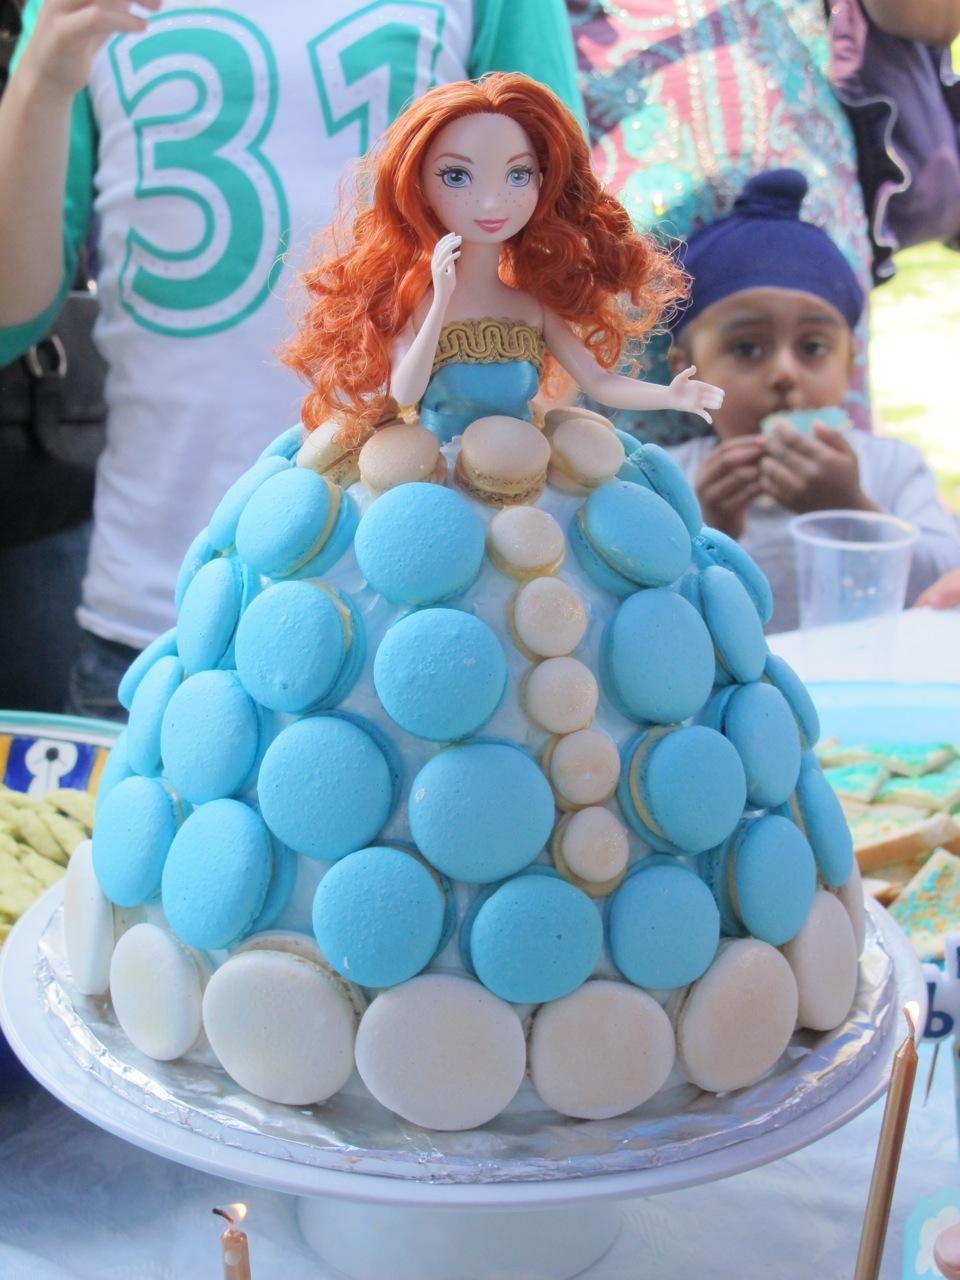 Princess Merida Macaron Cake